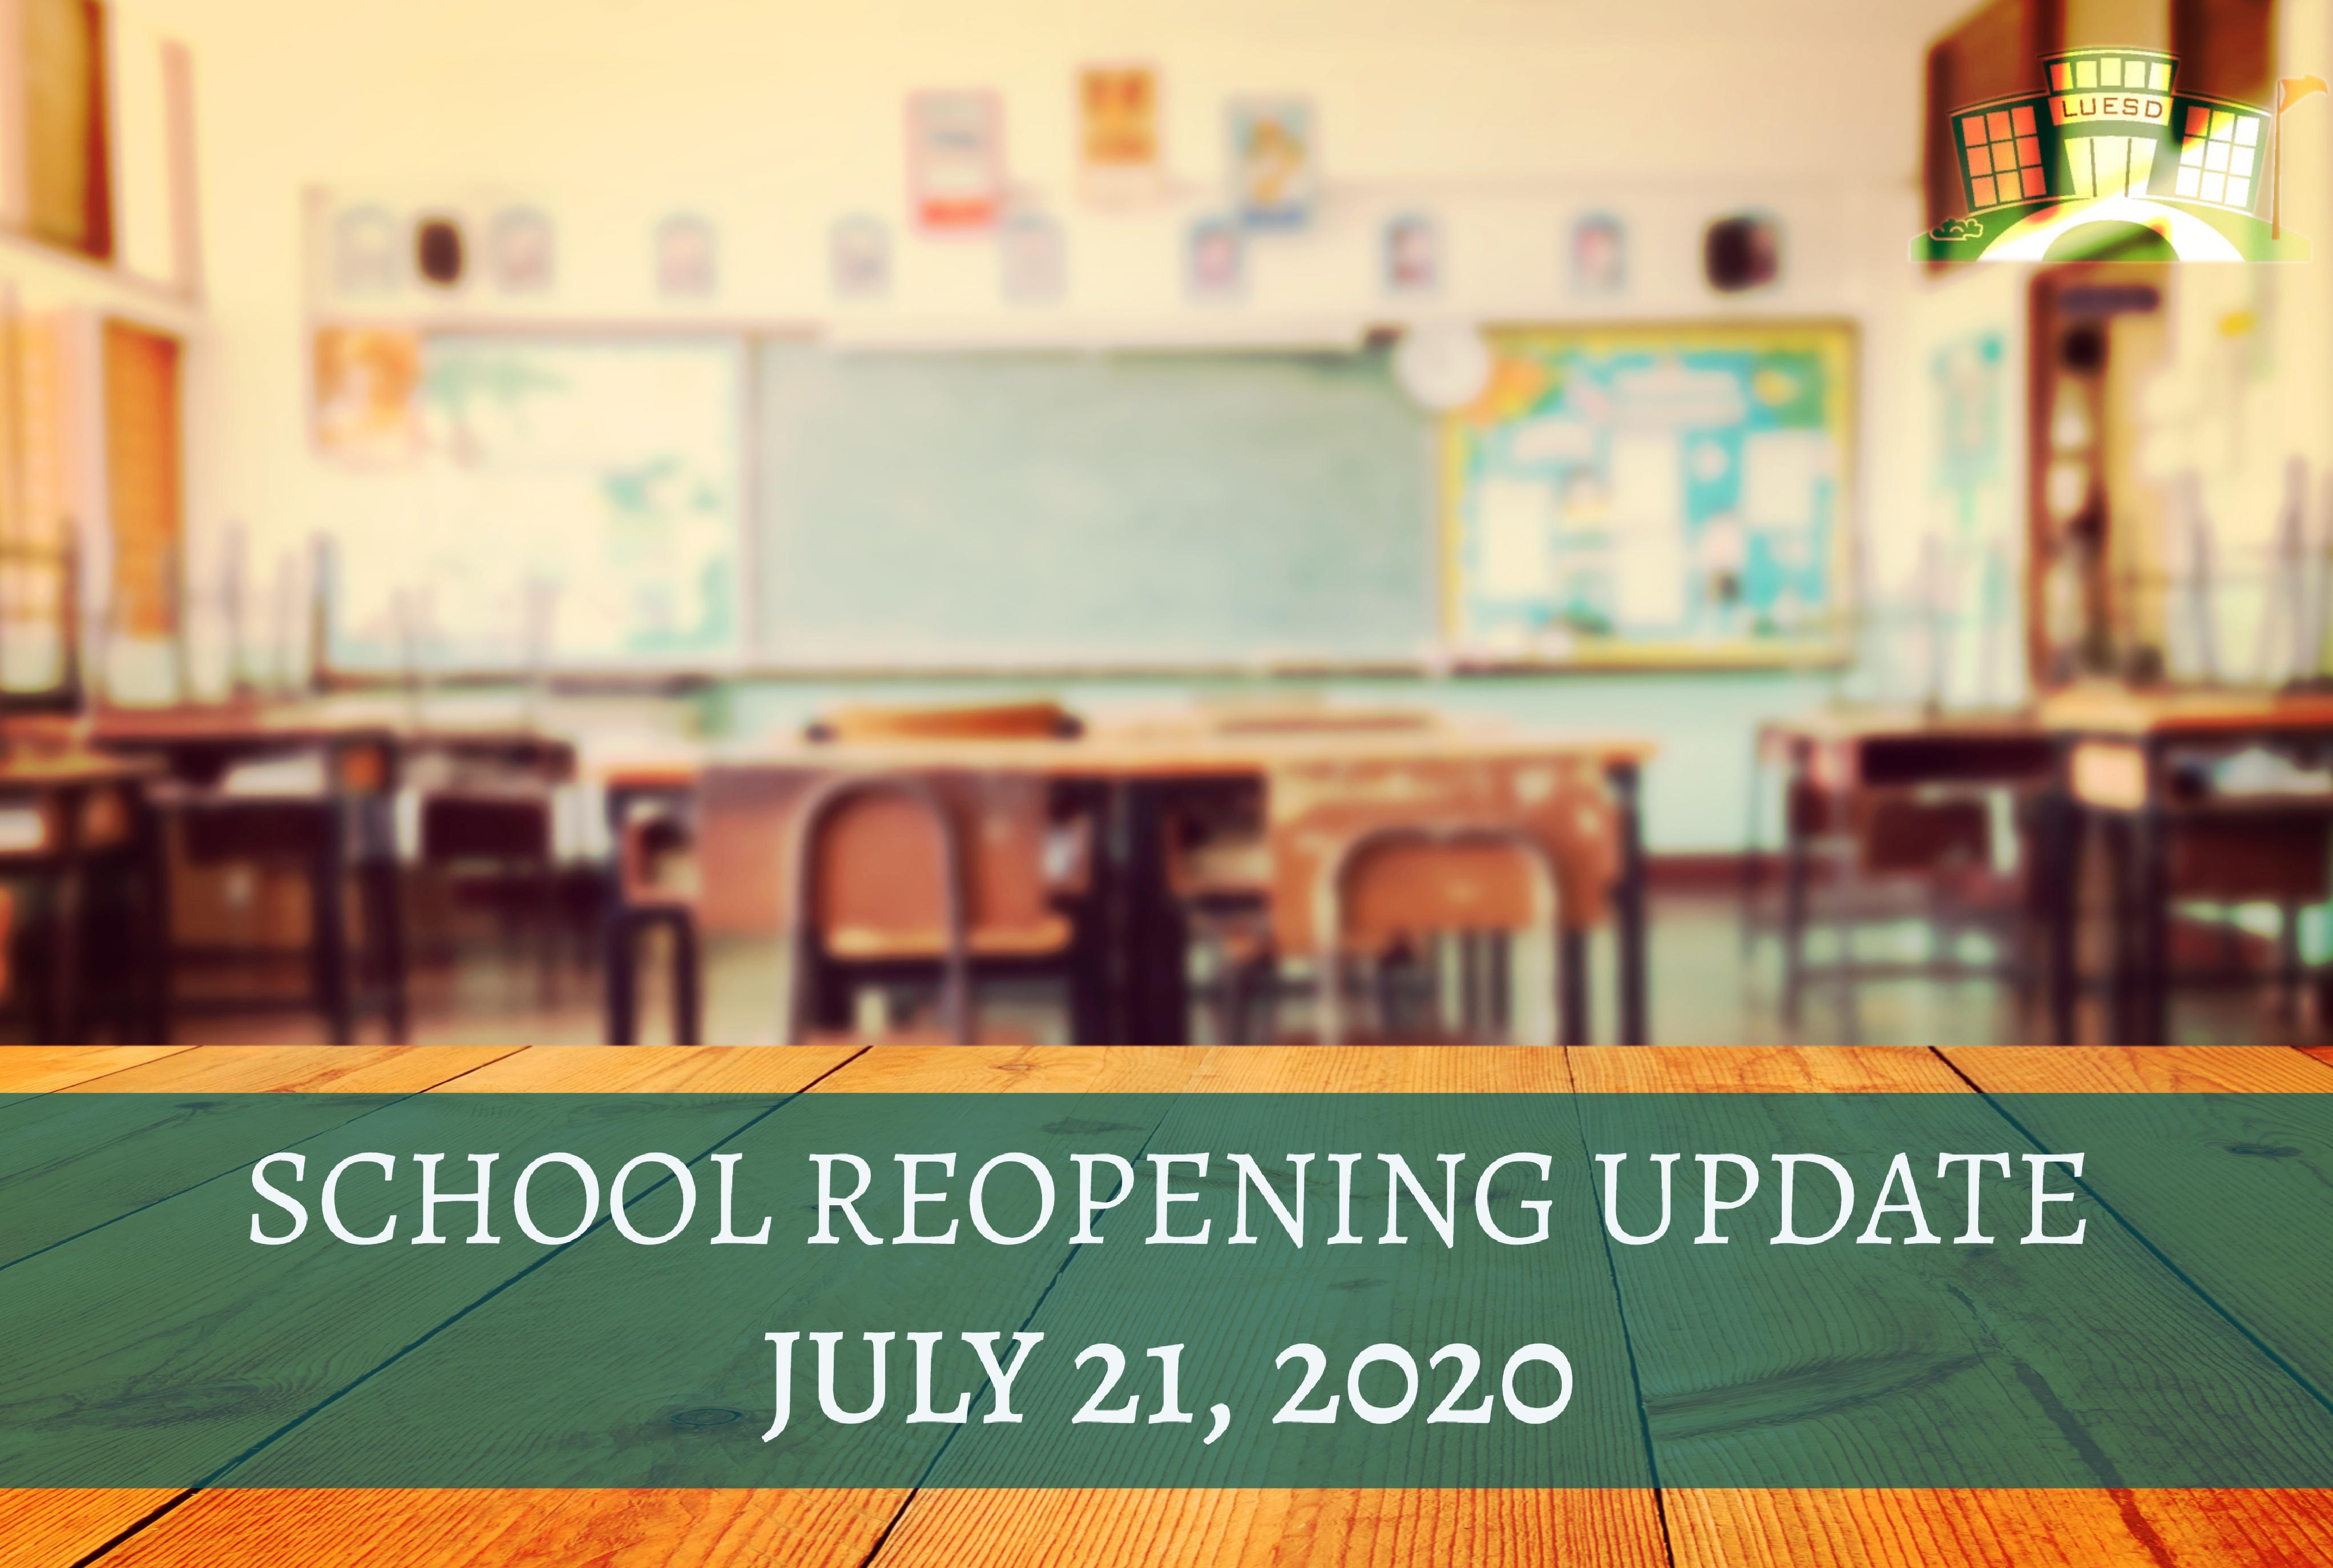 School ReOpening Update July 21, 2020